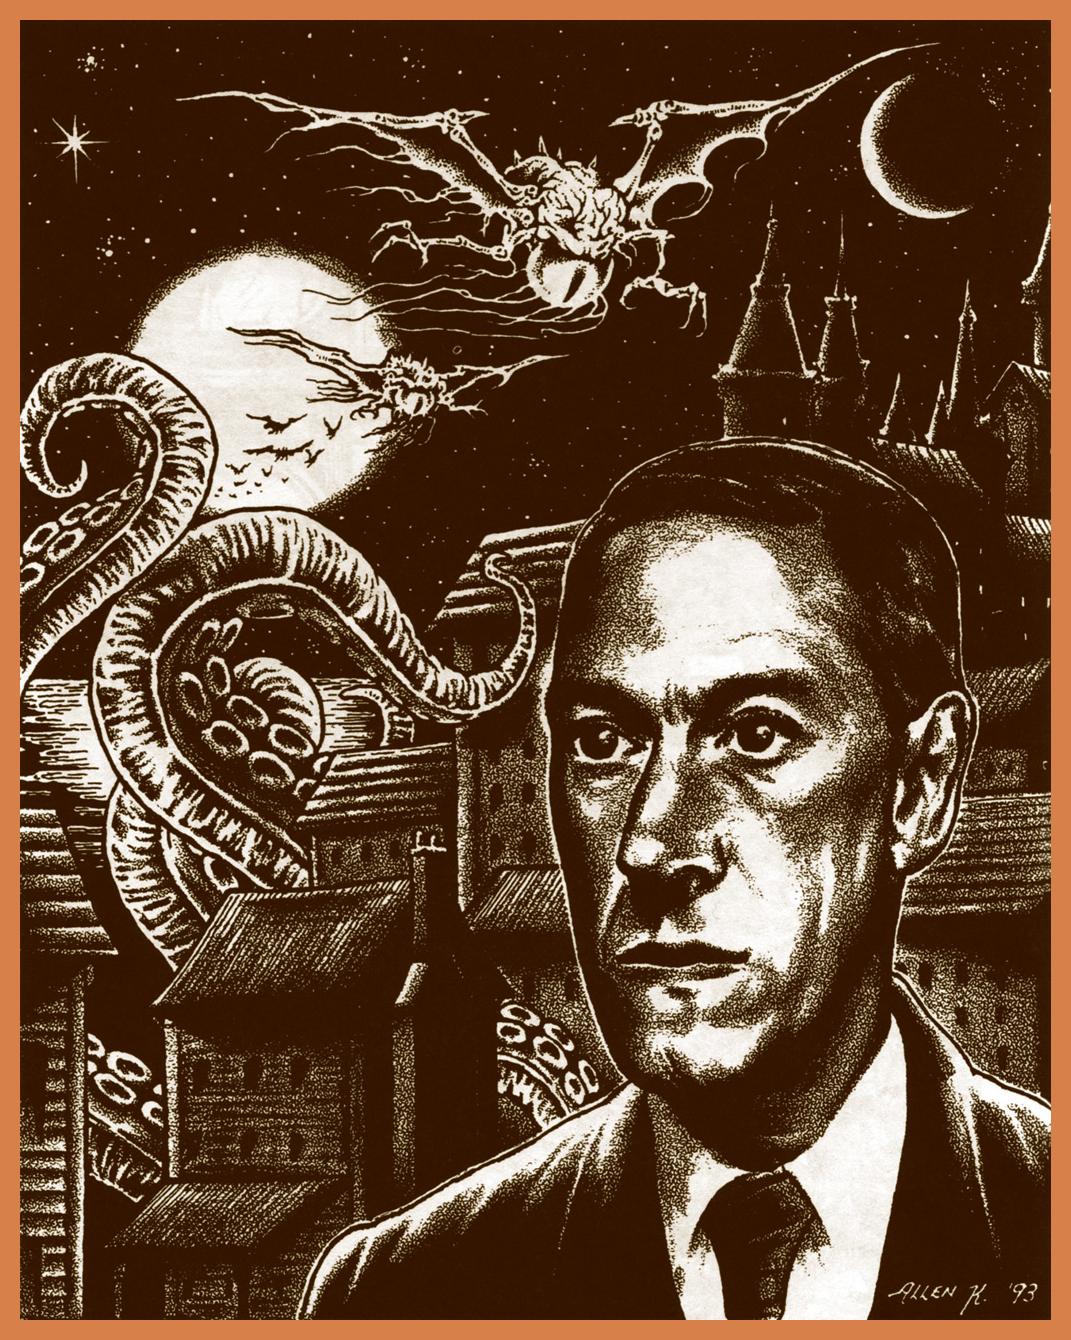 LovecraftPortraitA